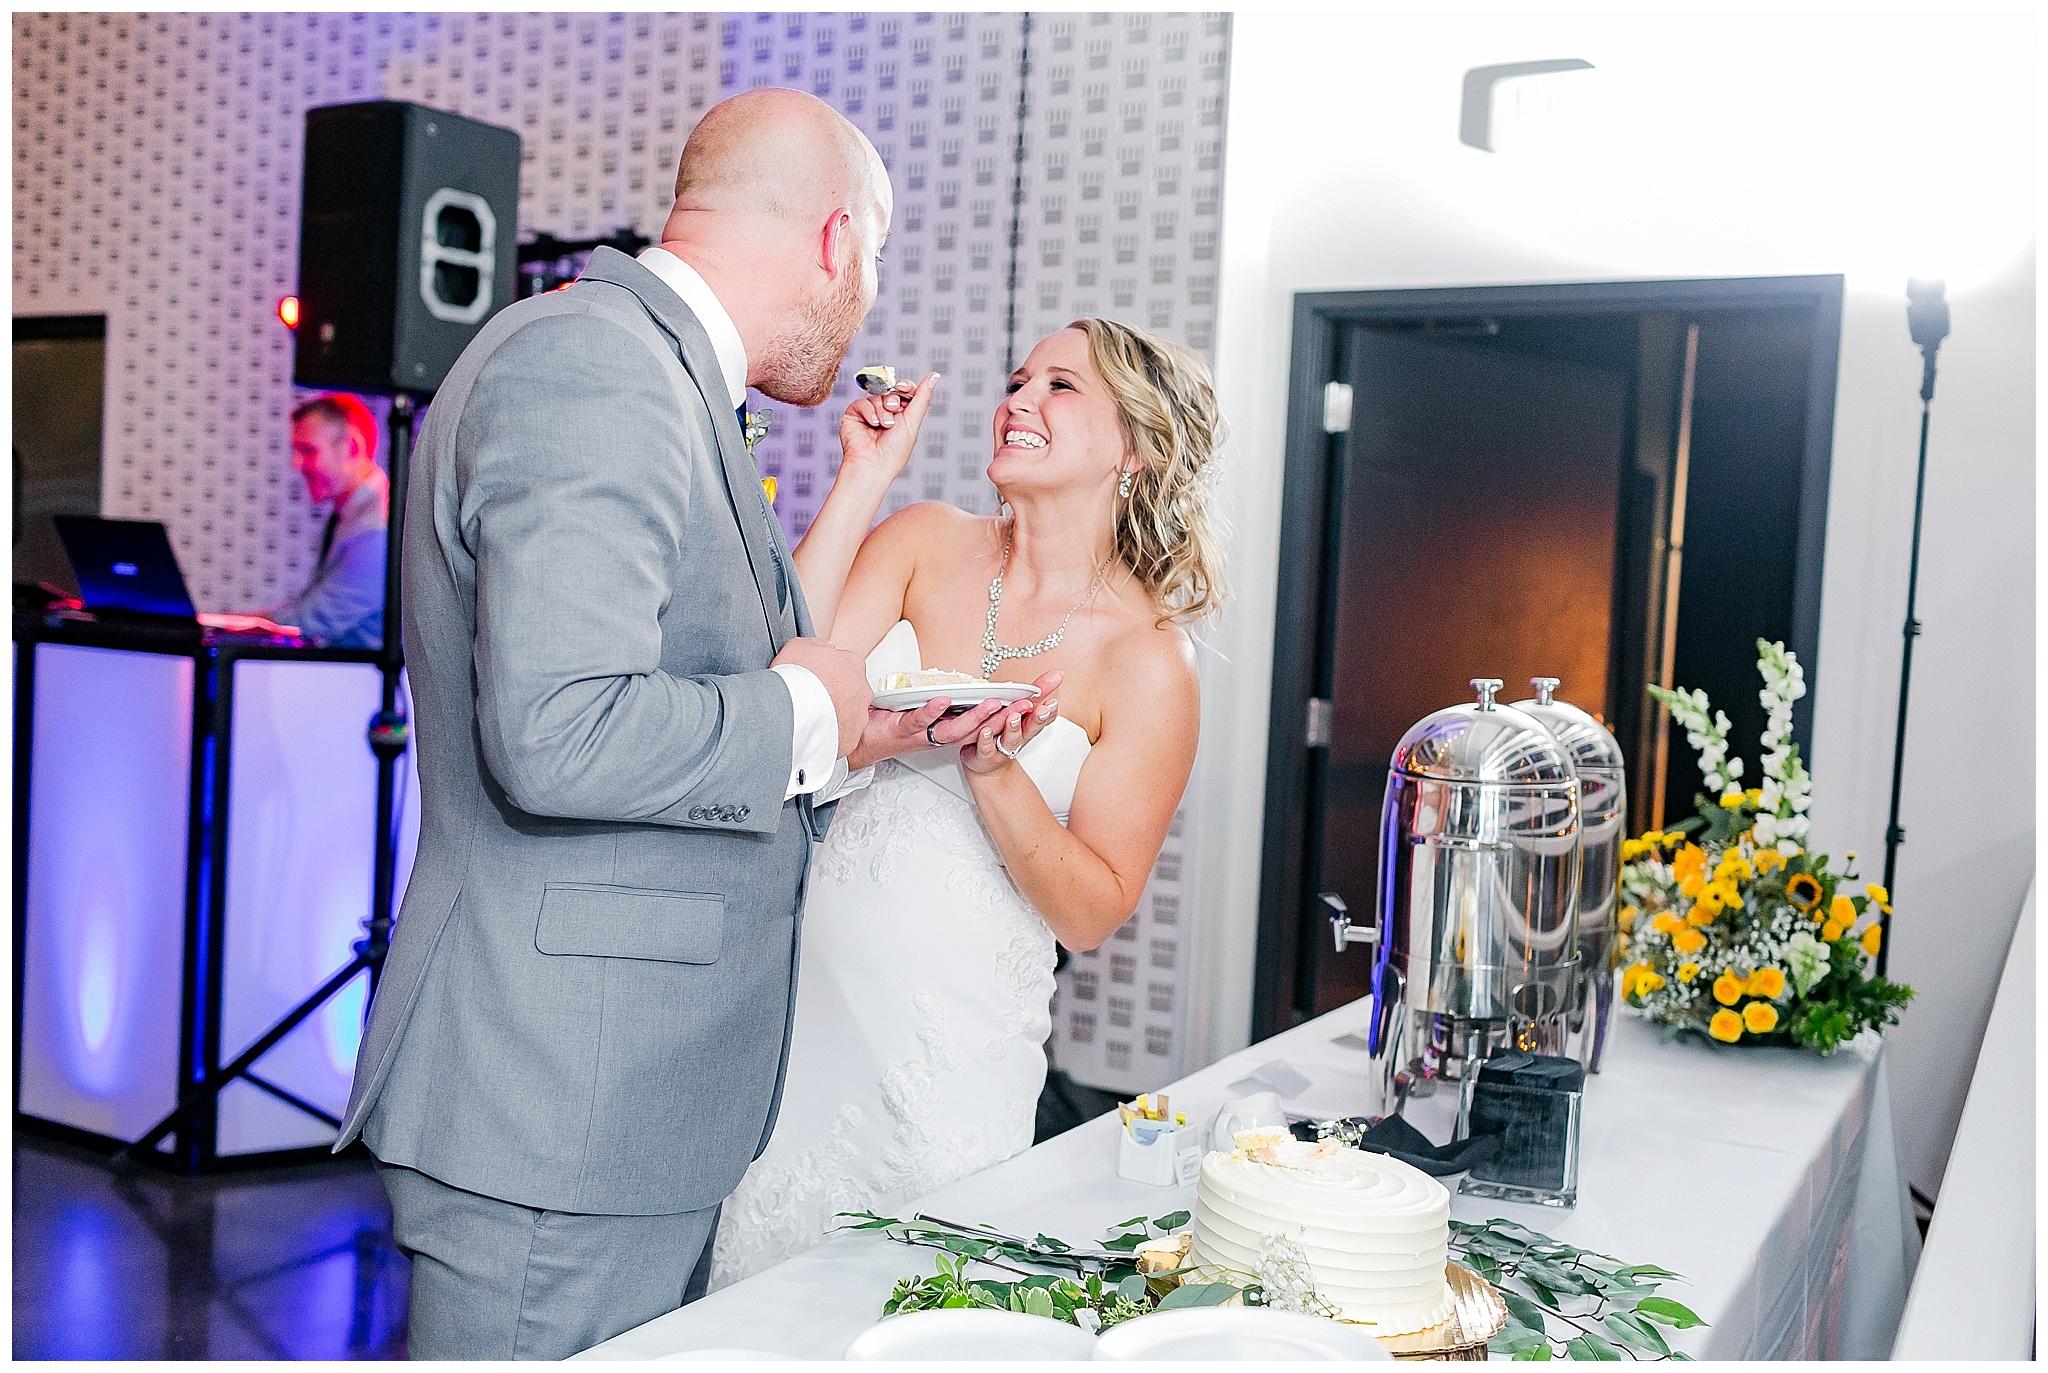 Venue_at_Milwaukee_Brewing_Company_wedding_milwaukee_wisconsin_0404.jpg